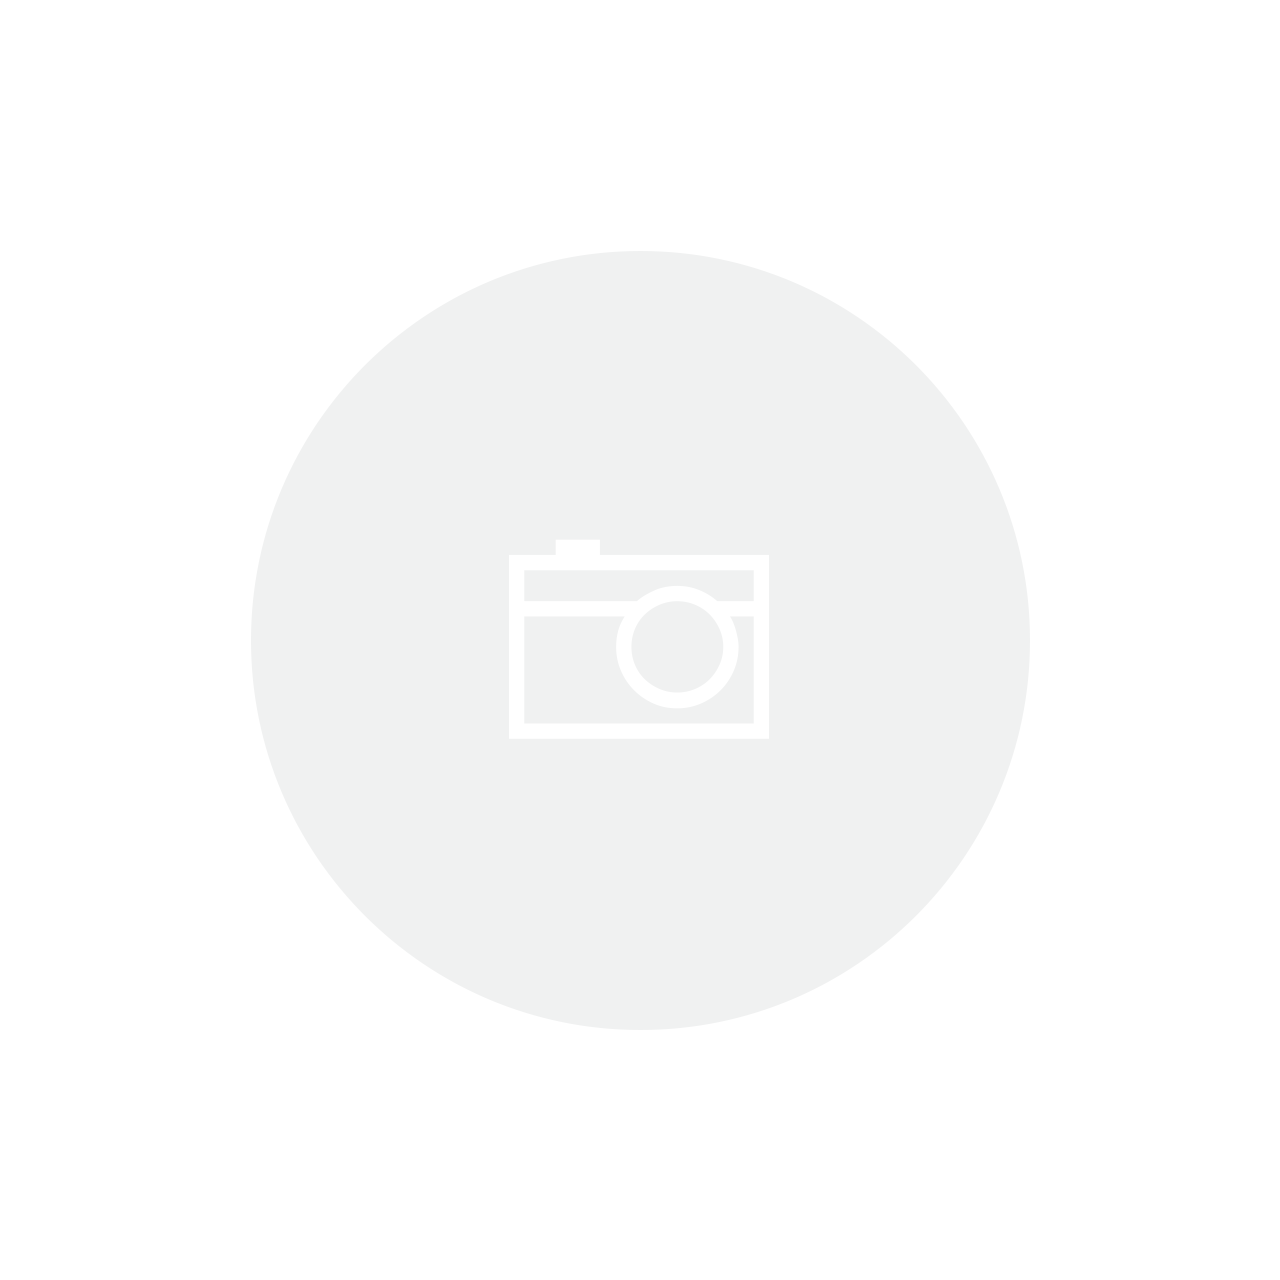 Fluido de Corte Integral 2x5 Litros